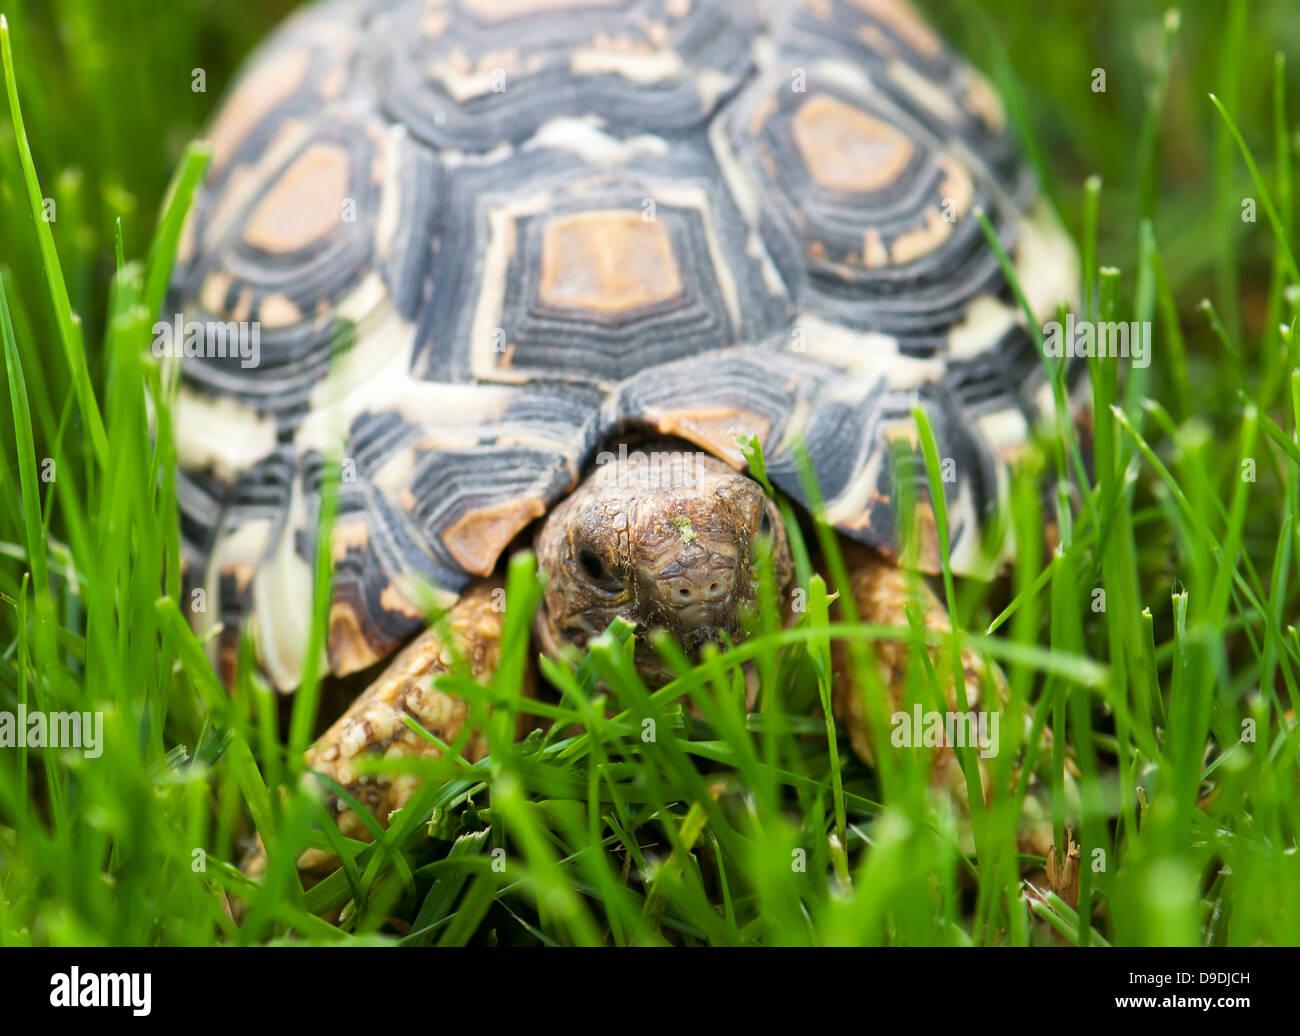 Mountain or leopard tortoise (Geochelone pardalis) walking in the green grass. - Stock Image